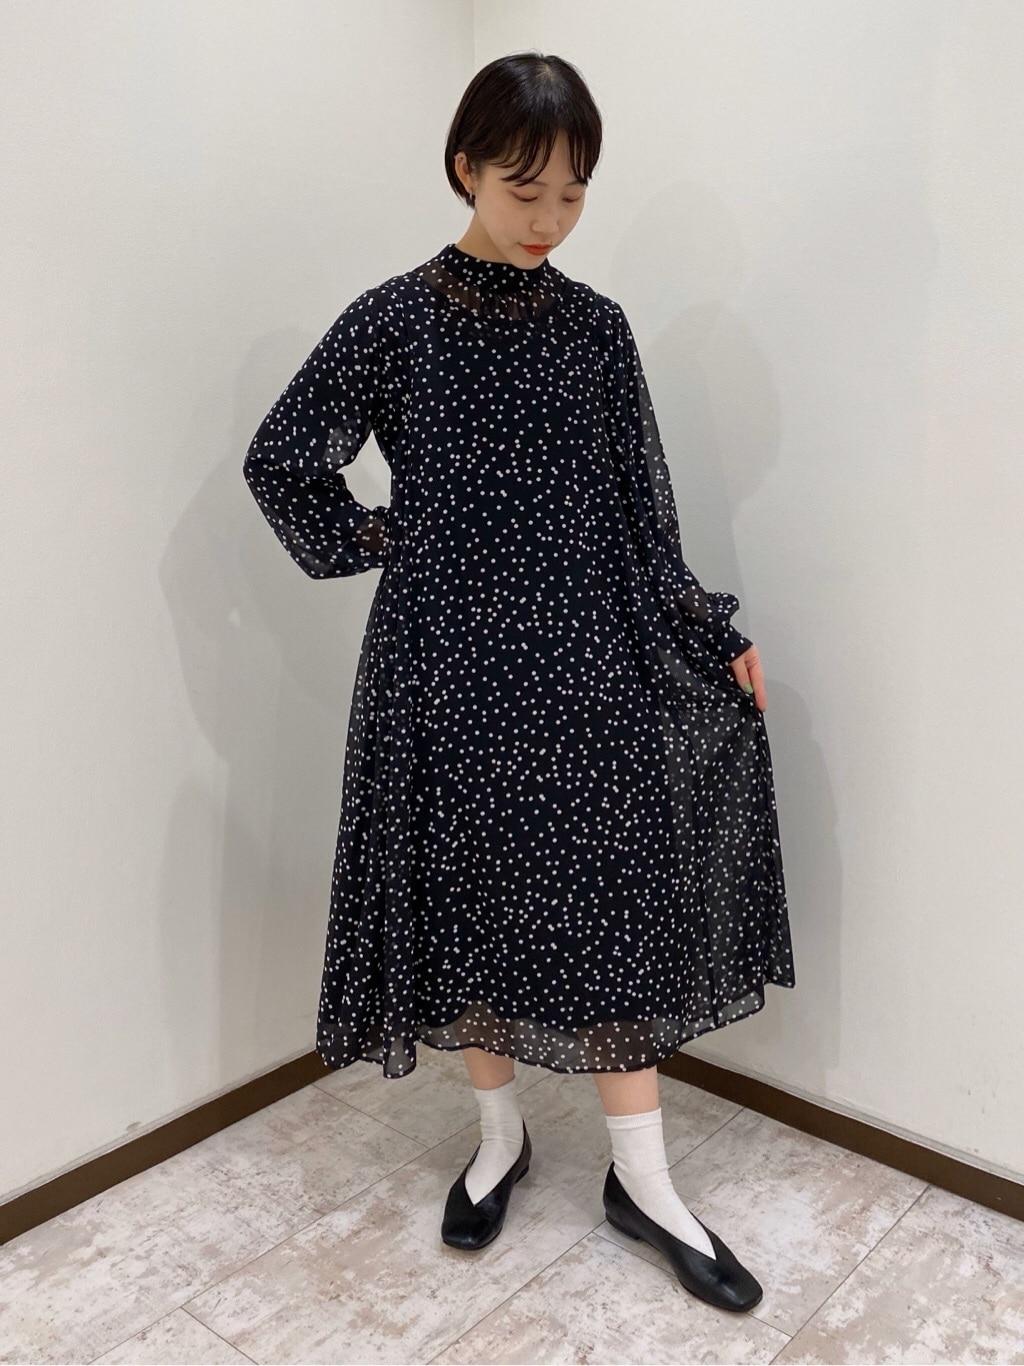 l'atelier du savon 新宿ミロード 身長:159cm 2020.04.01